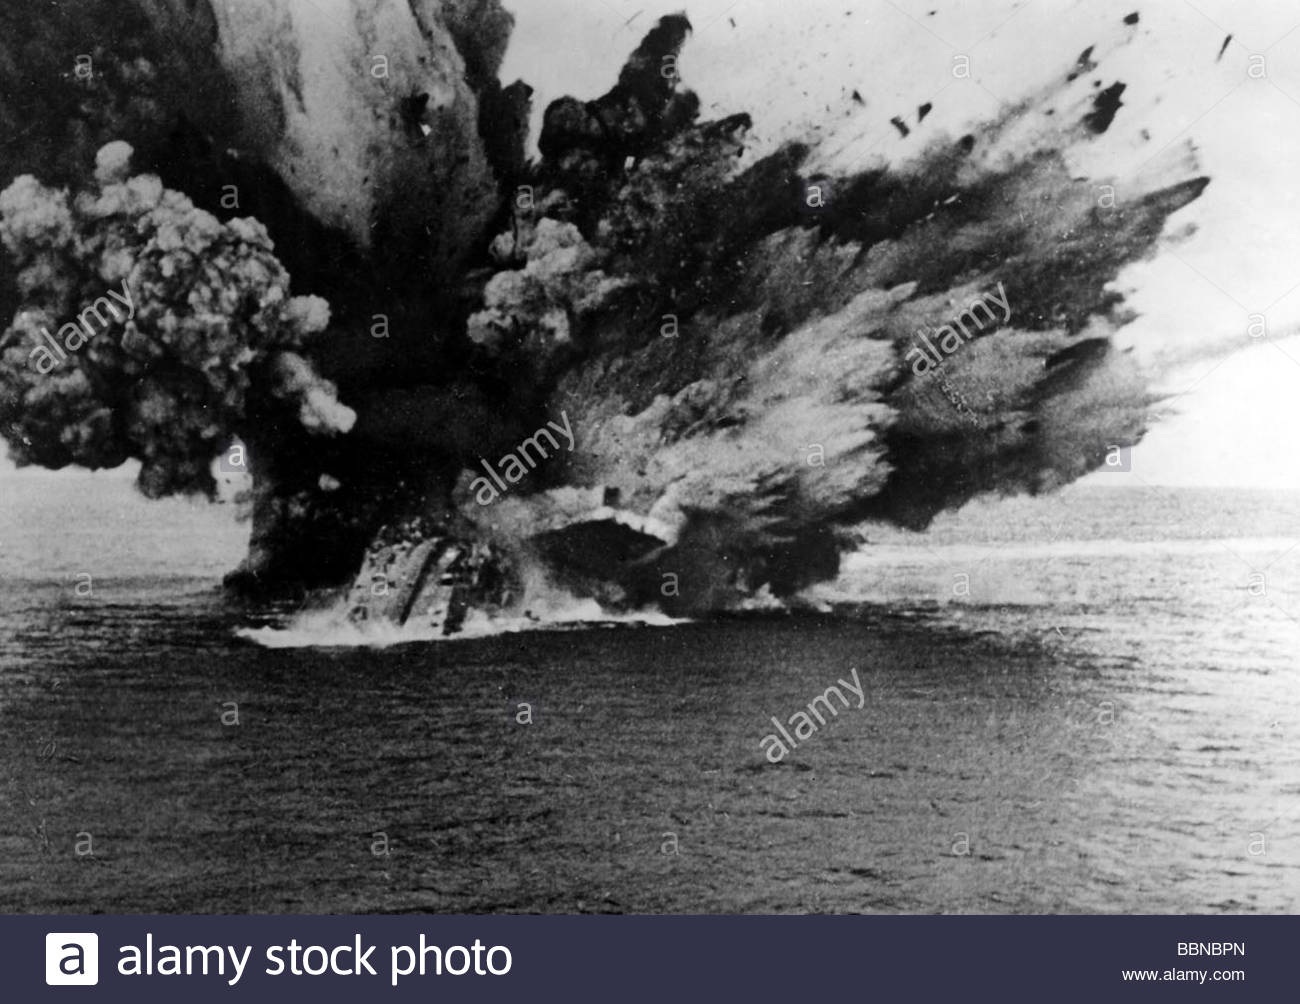 events-second-world-war-wwii-naval-warfare-british-battleship-hms-BBNBPN.jpg